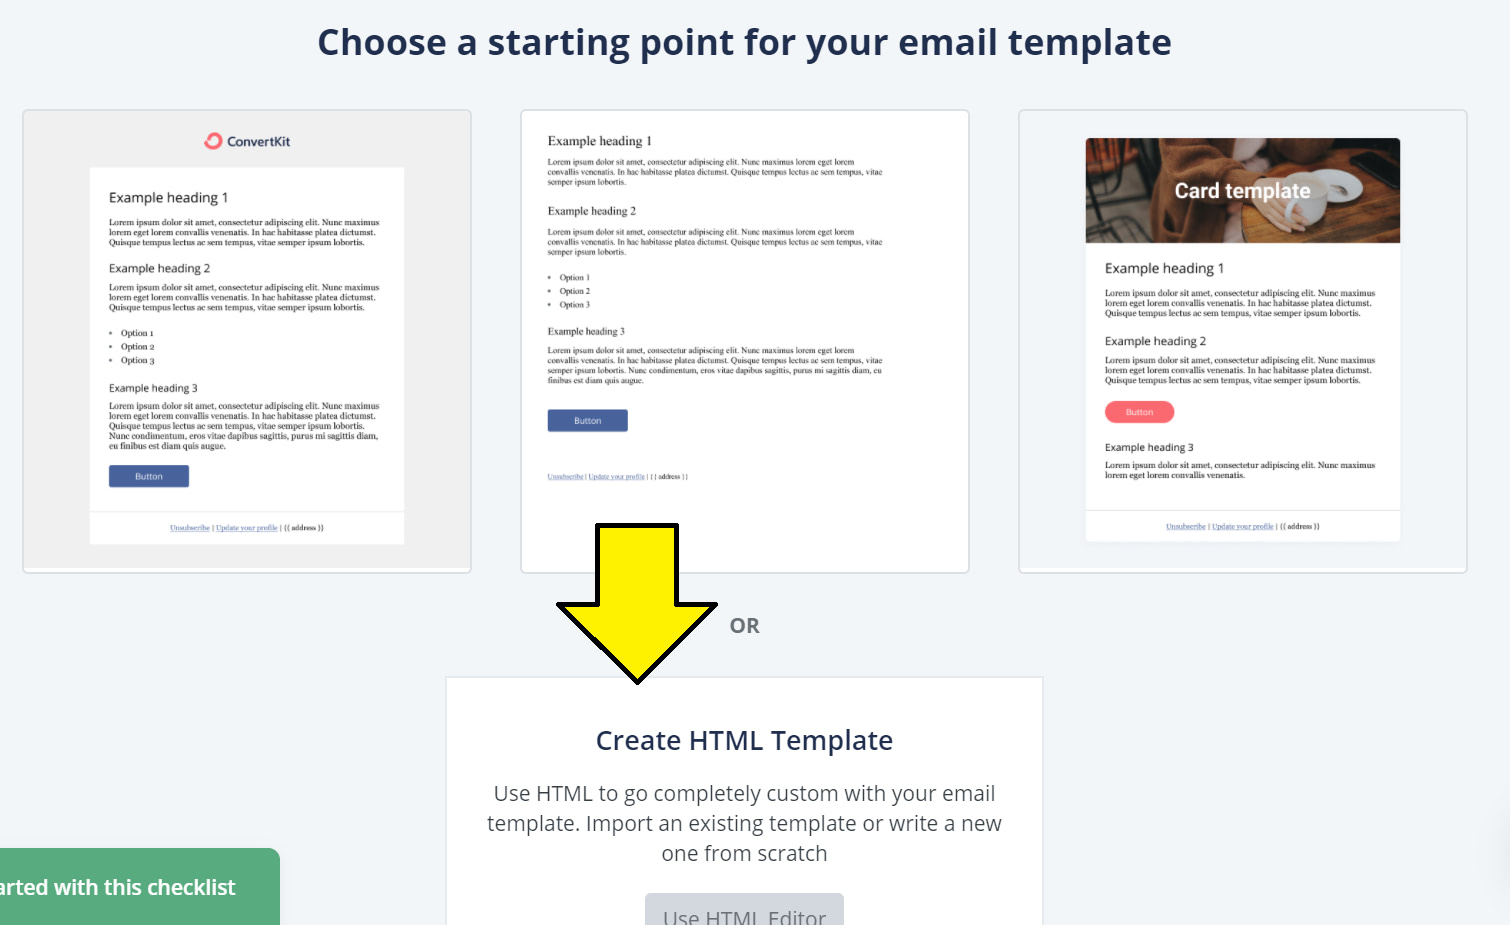 Create HTML Template